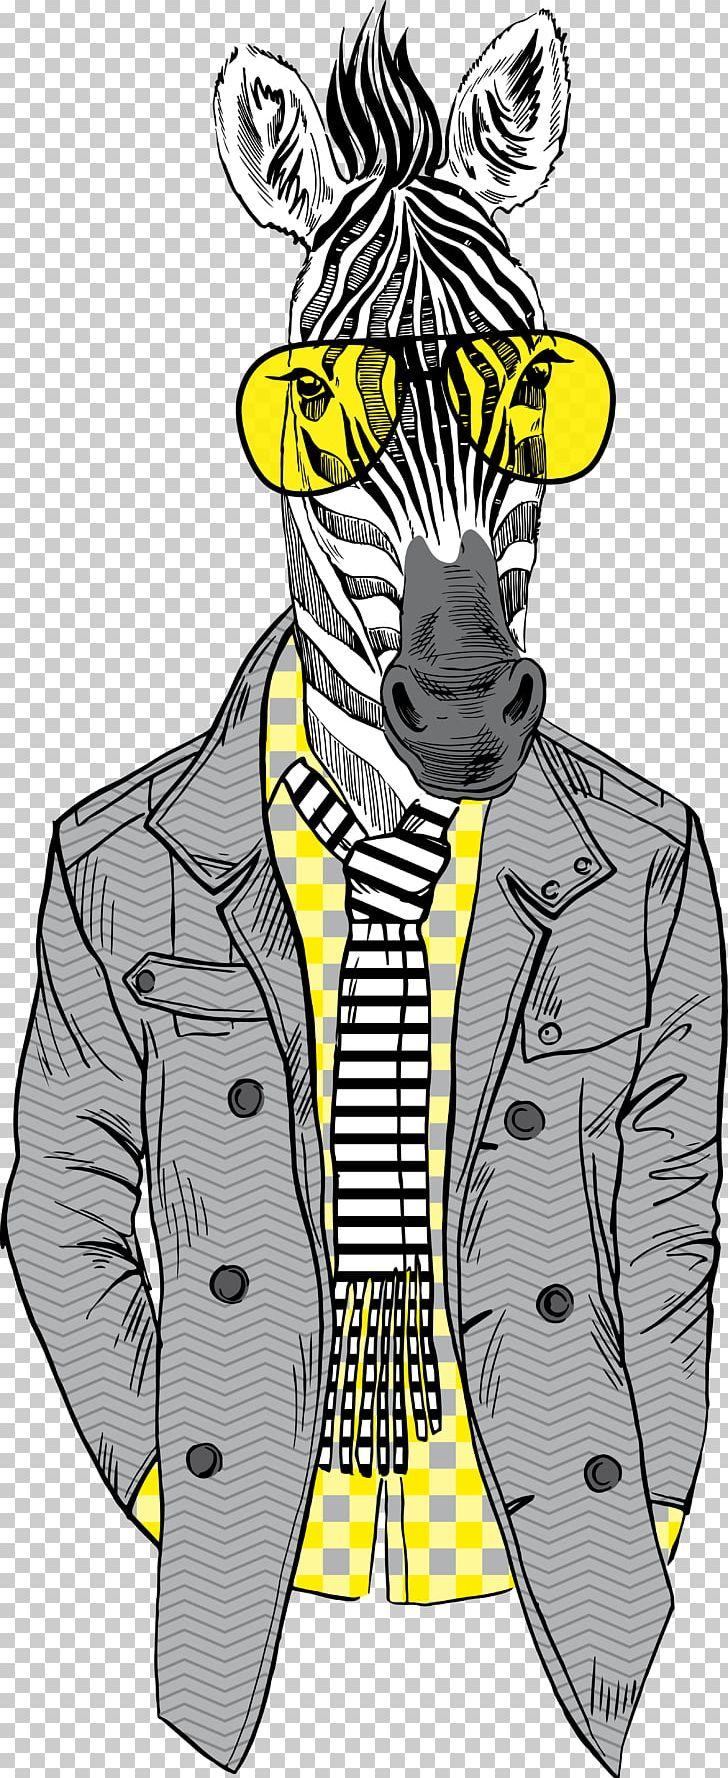 Horse Fashion Illustration Zebra PNG, Clipart, Animal.